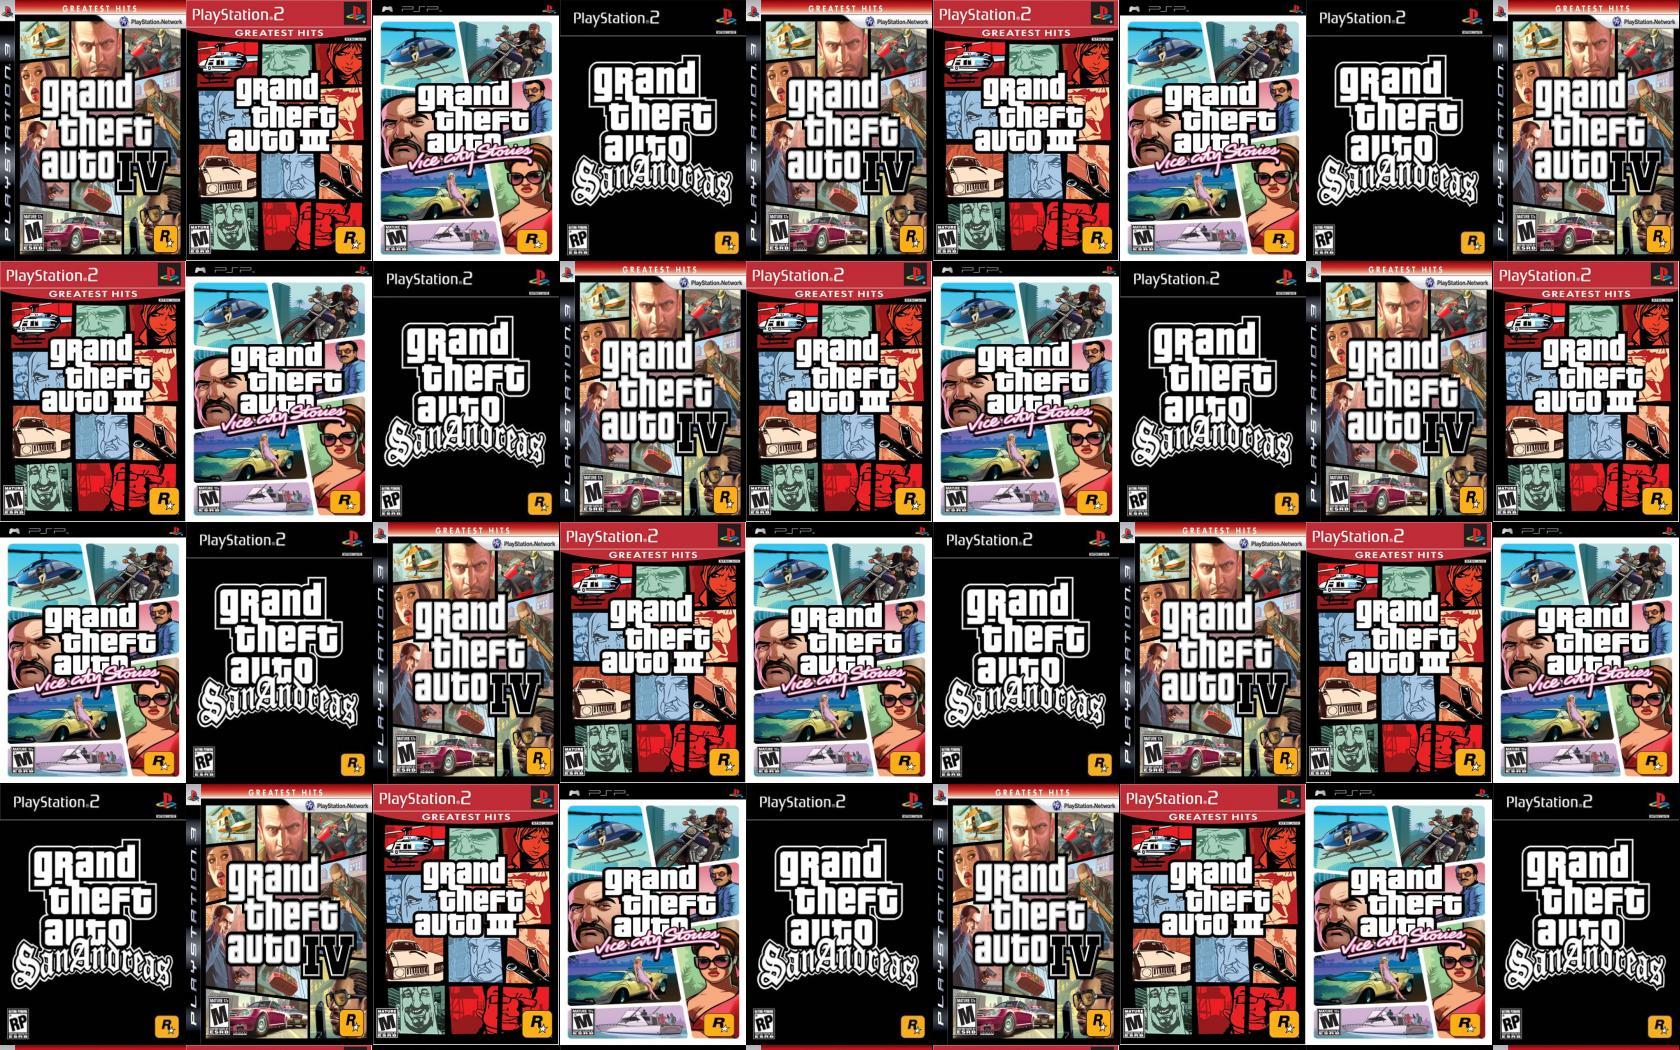 Grand Theft Auto Vice City Tiled Desktop Wallpaper